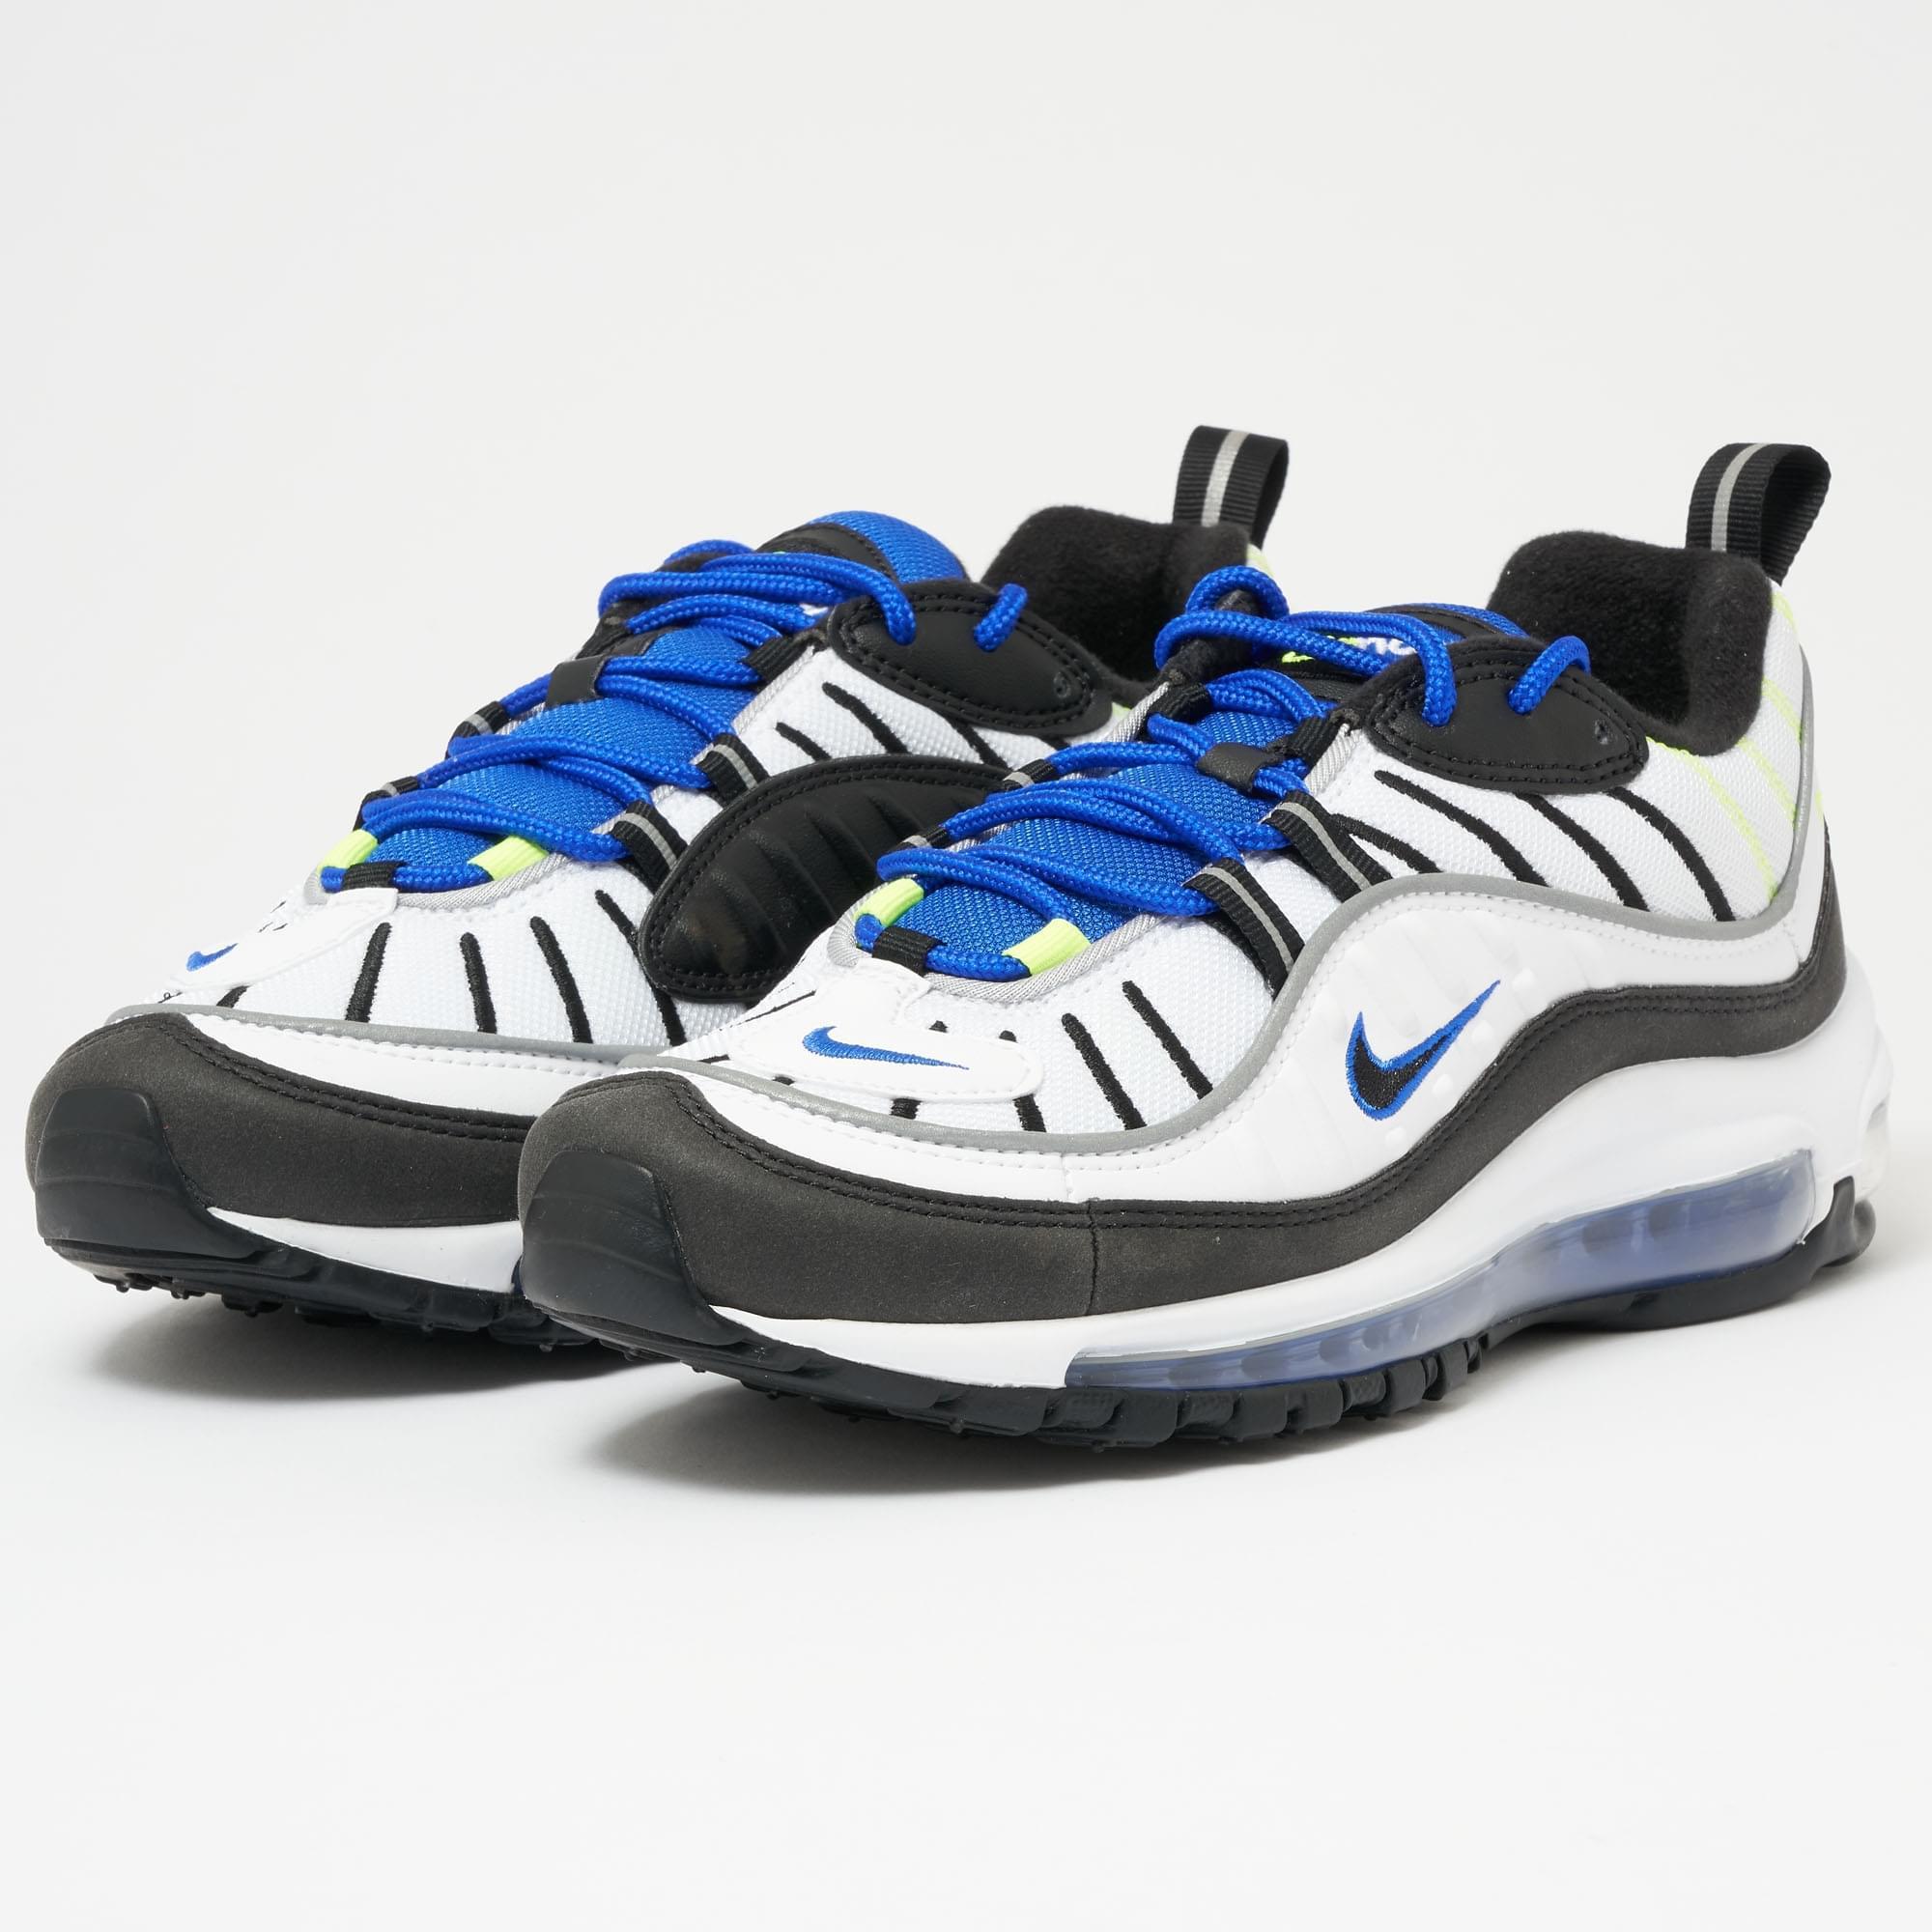 nike air max 98 white black racer blue